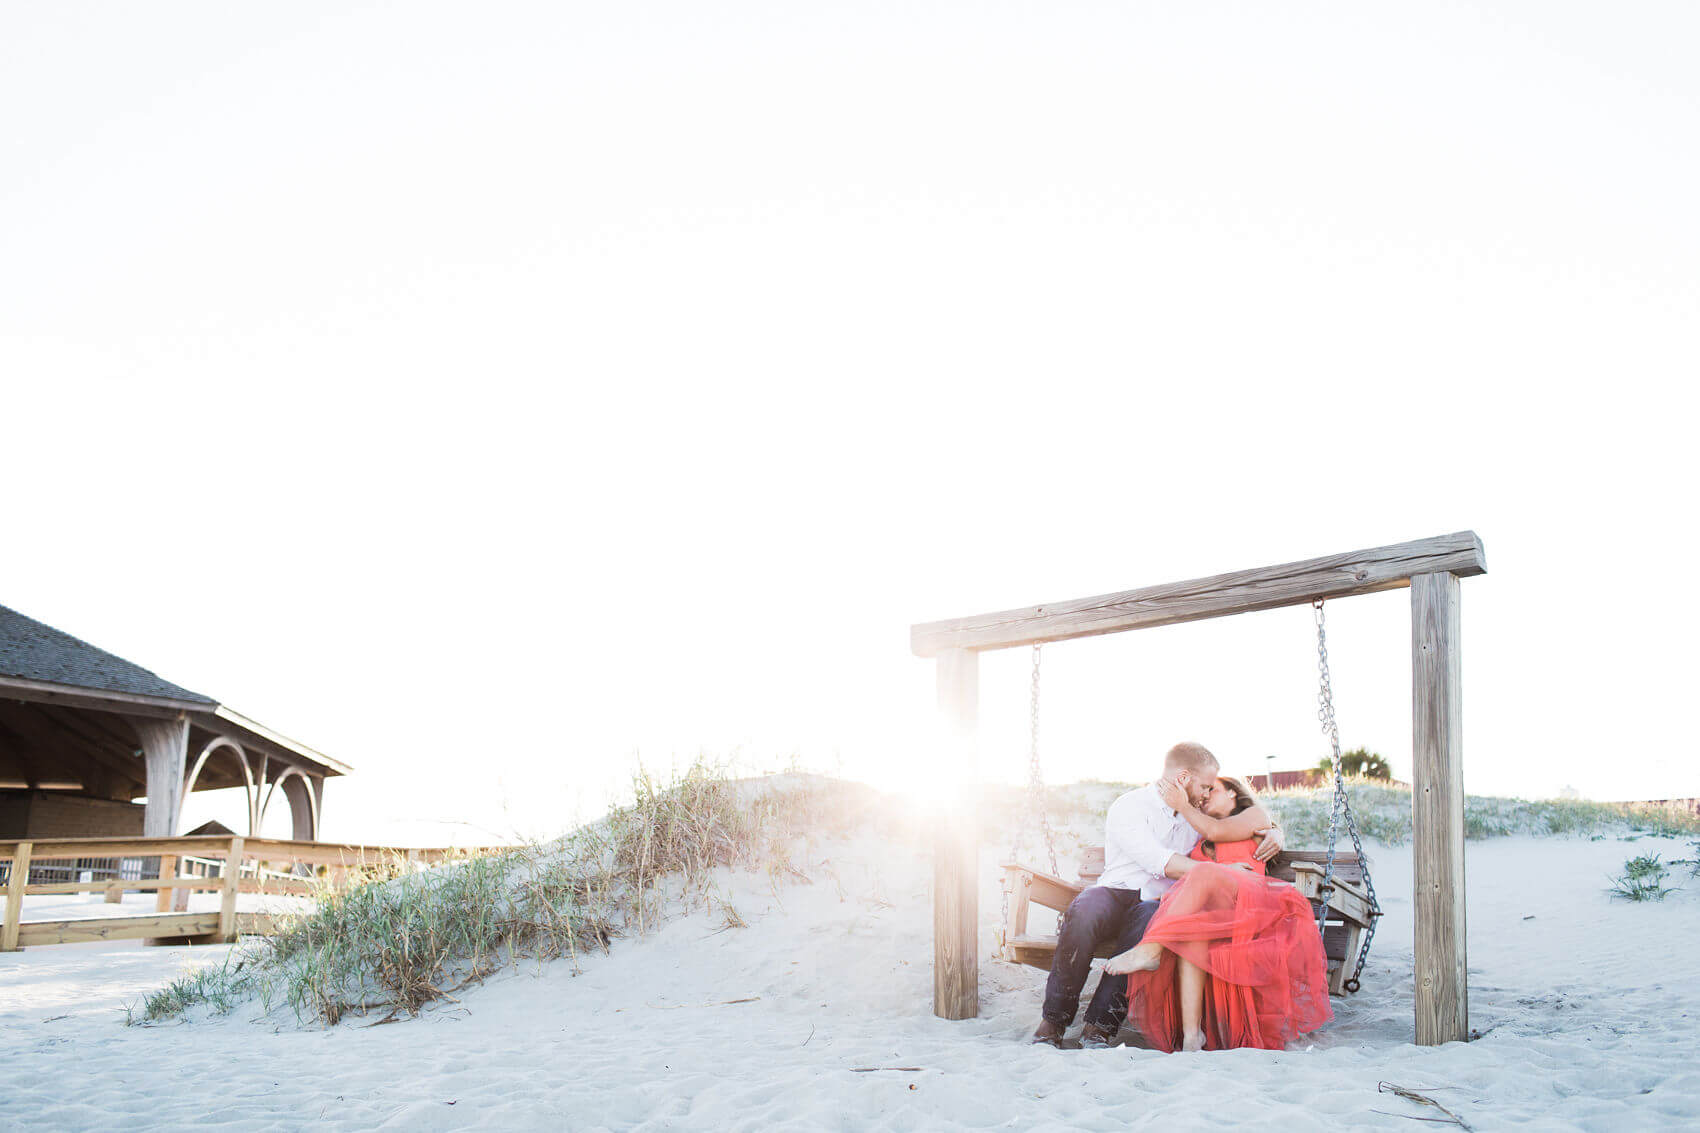 Apt-b-photography-savannah-engagement-photographer-savannah-wedding-hilton-head-elopement-savannah-wedding-photographer-40.jpg